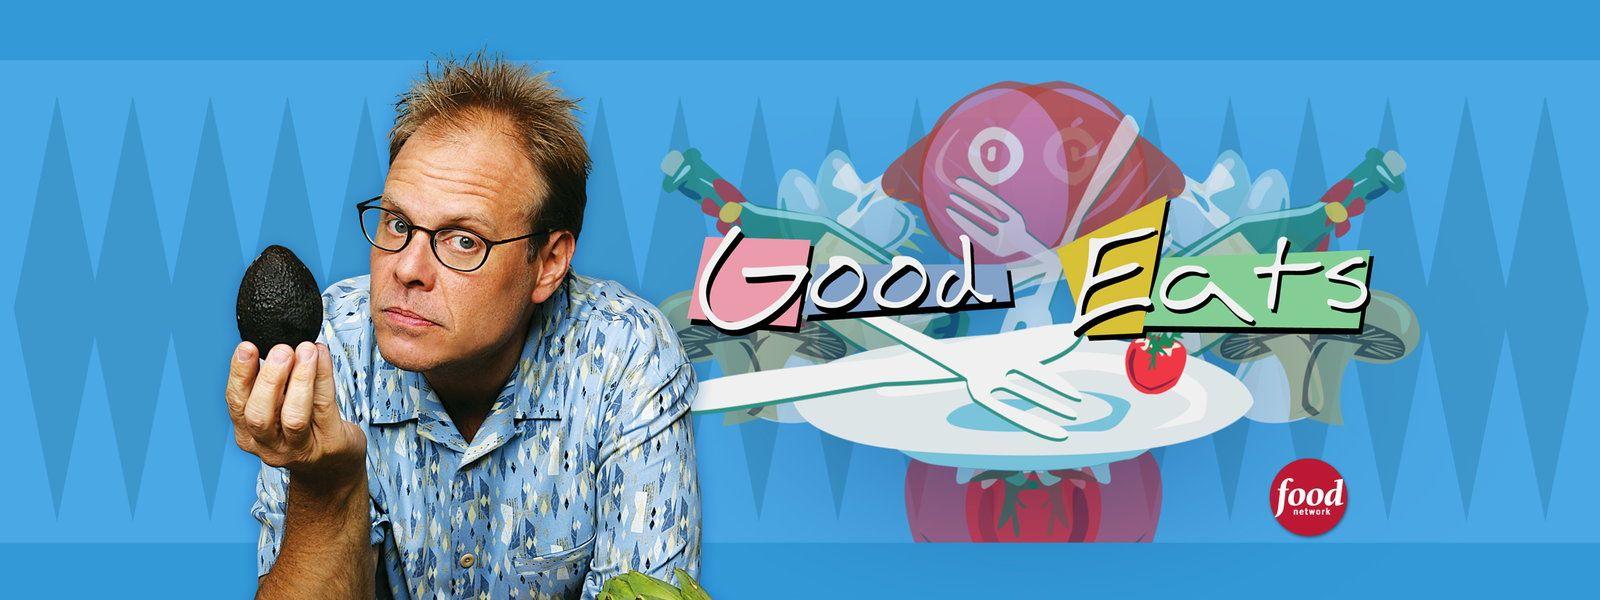 Watch Good Eats online | Free | Hulu some episodes. Season 1 is ...